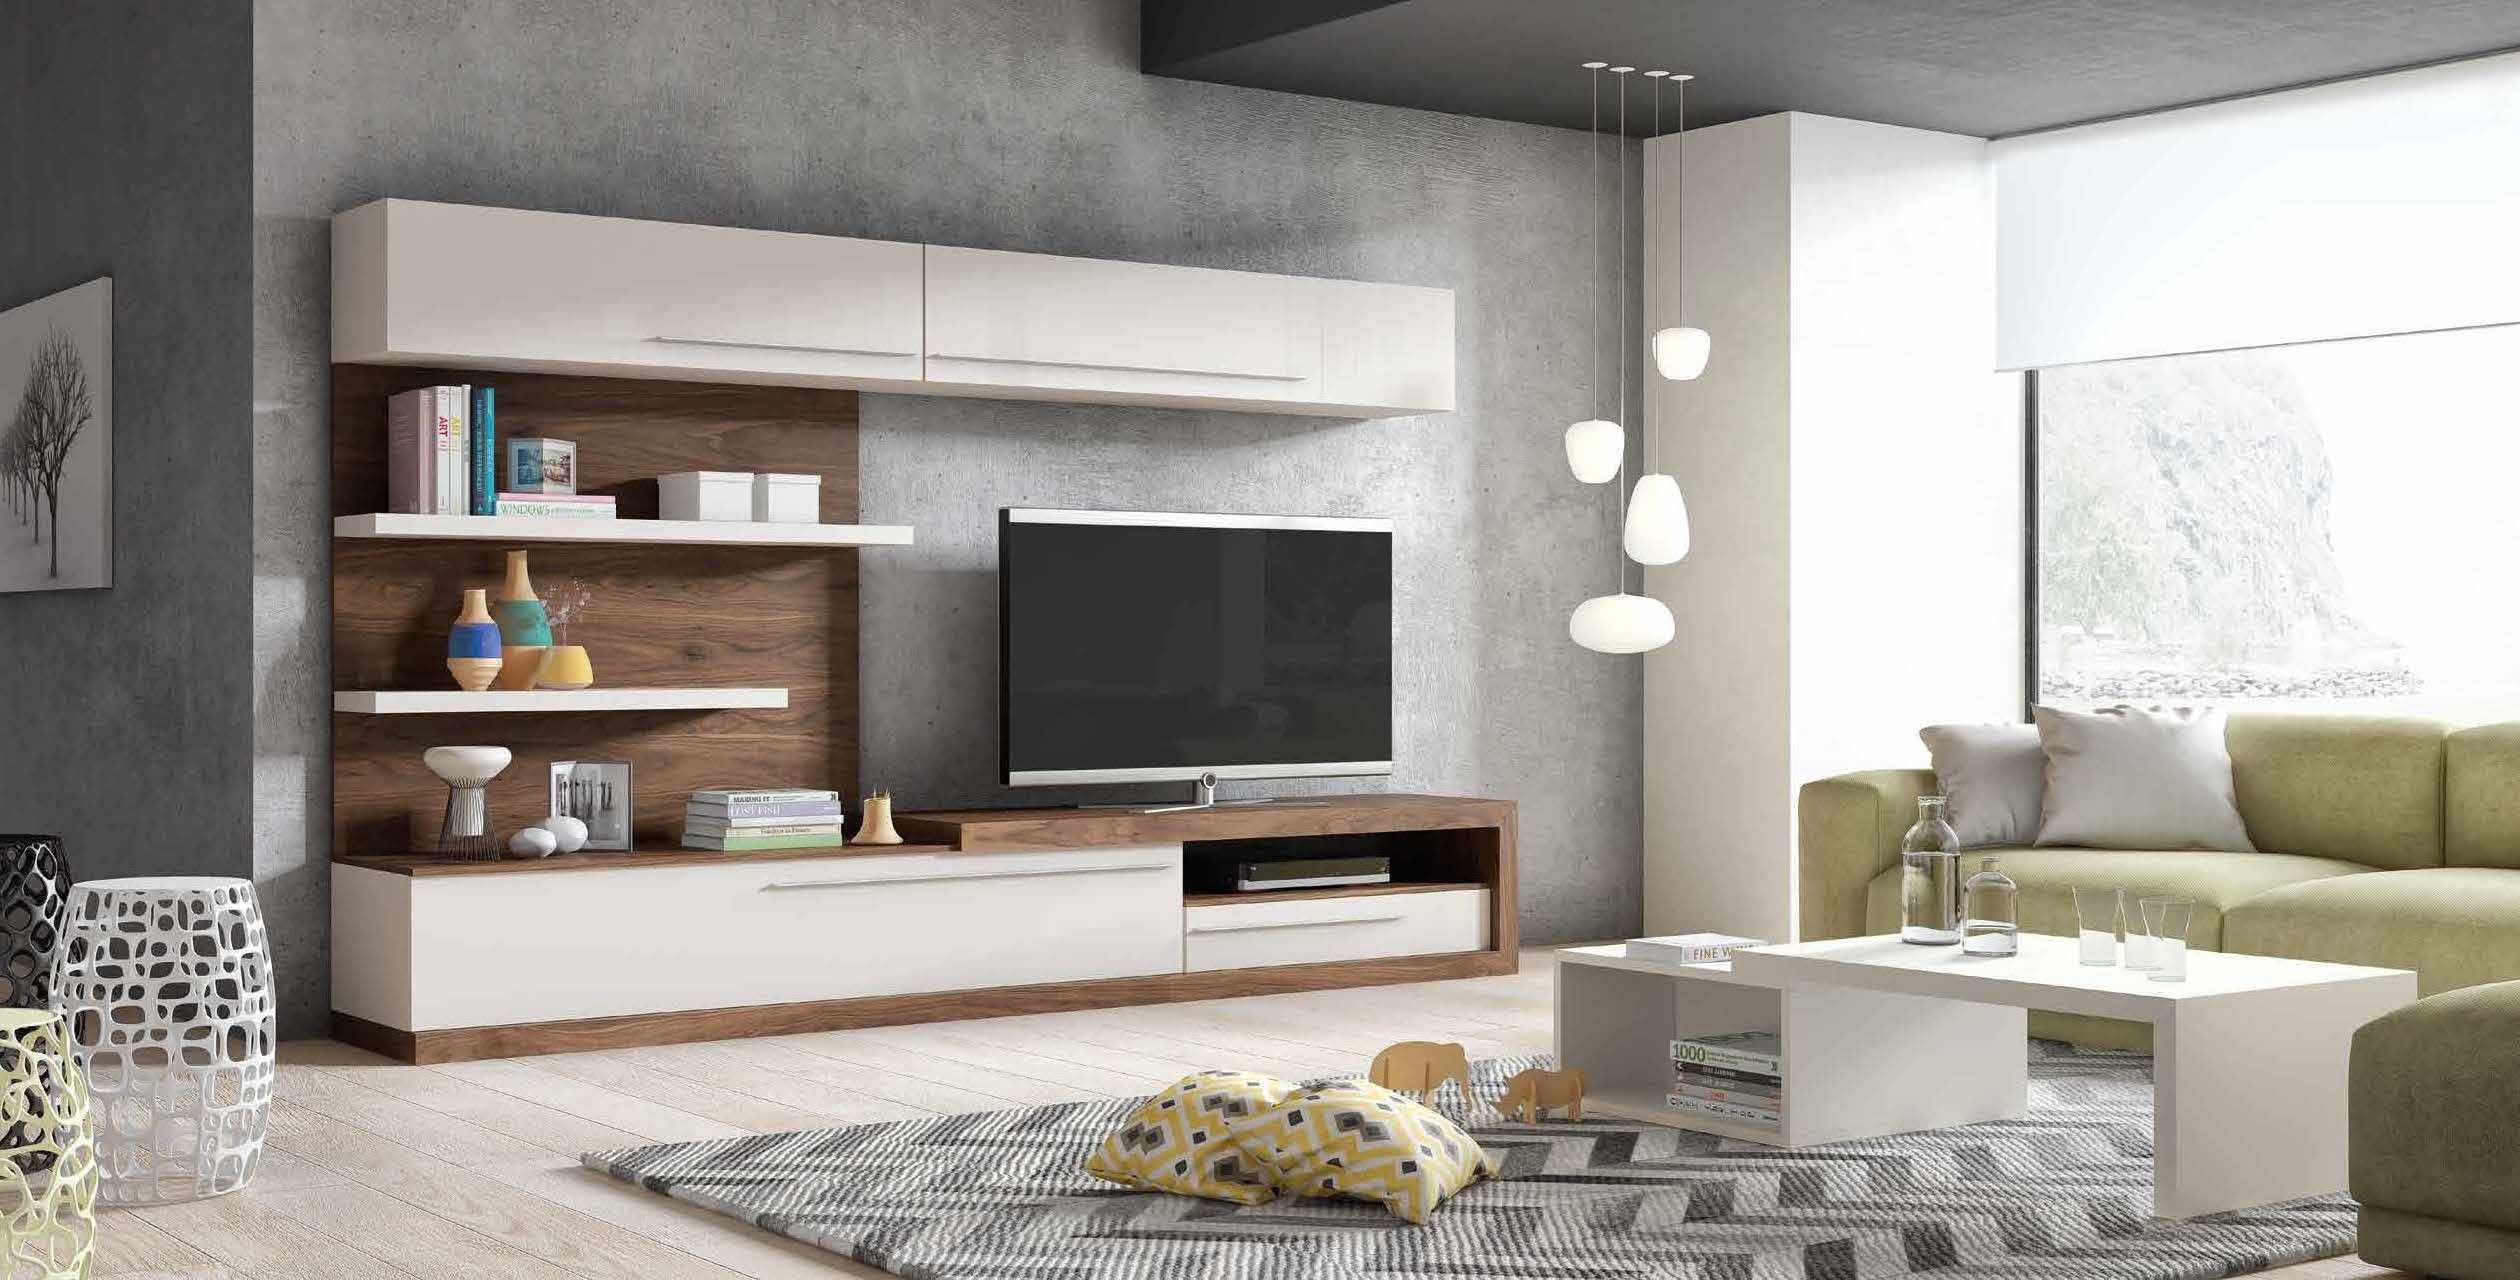 Mueble de sal n netro 11 mesegu en 2019 sala muebles - Muebles salon modernos ...